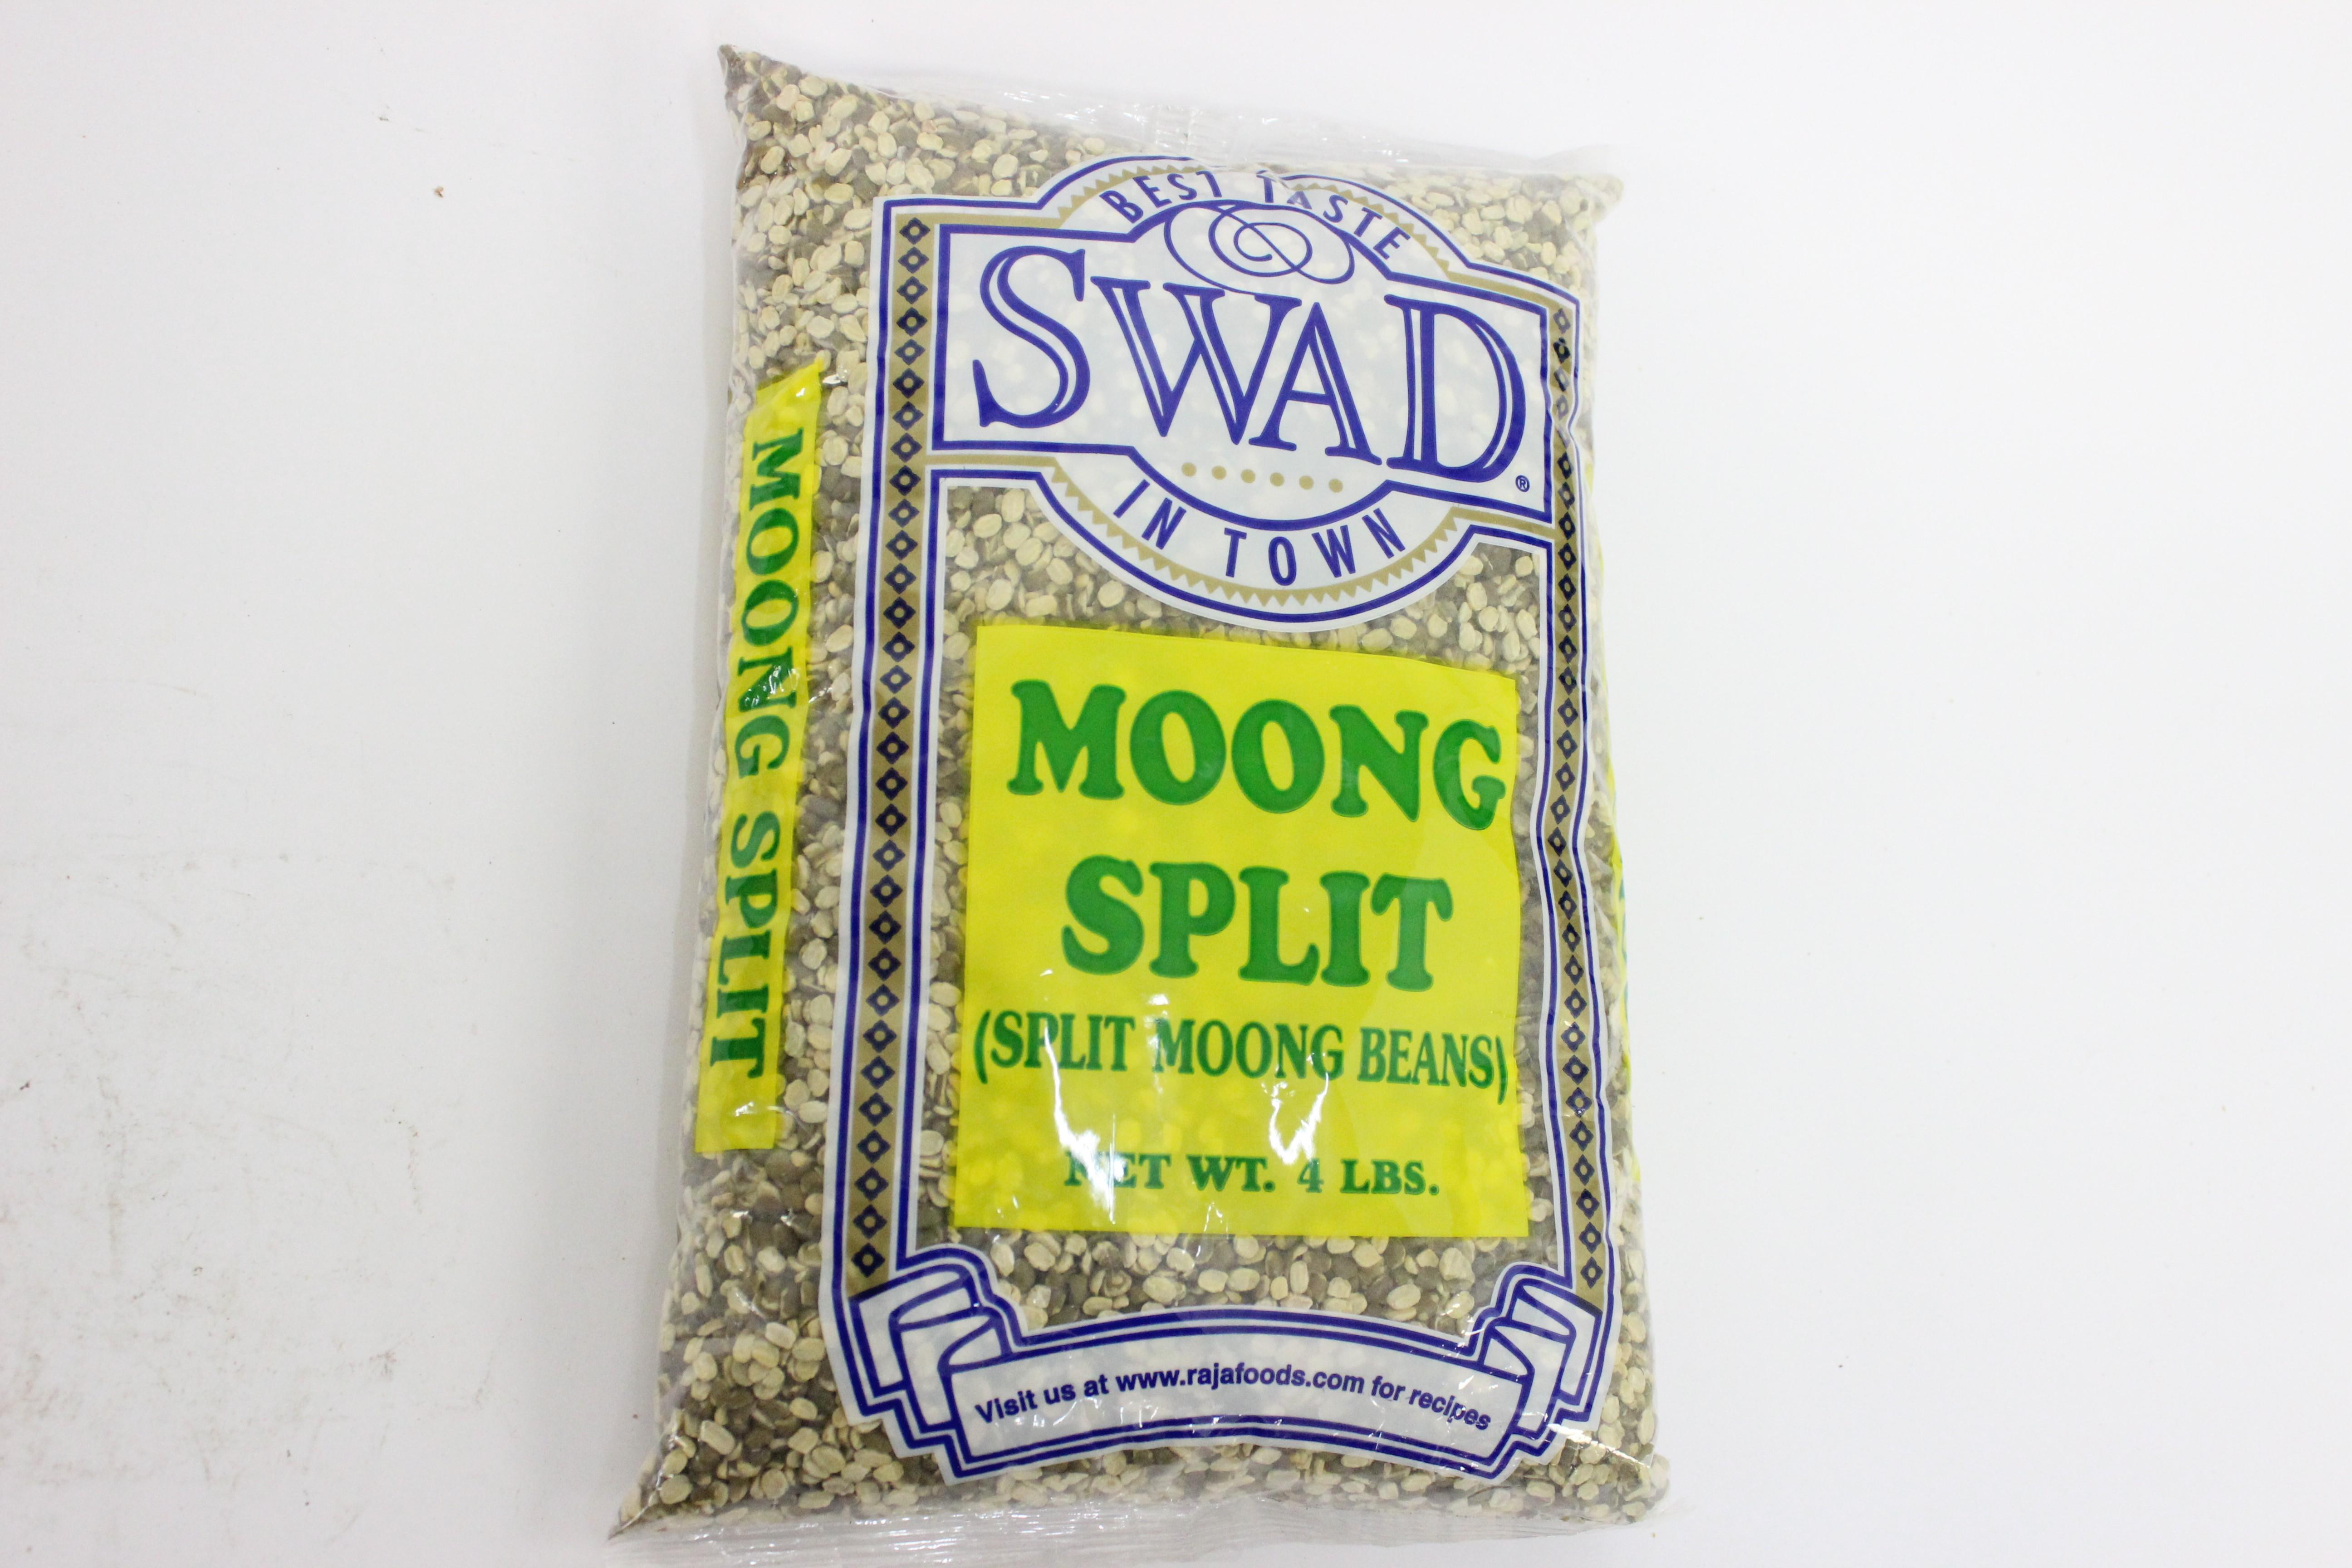 Moong Split 4 lbs